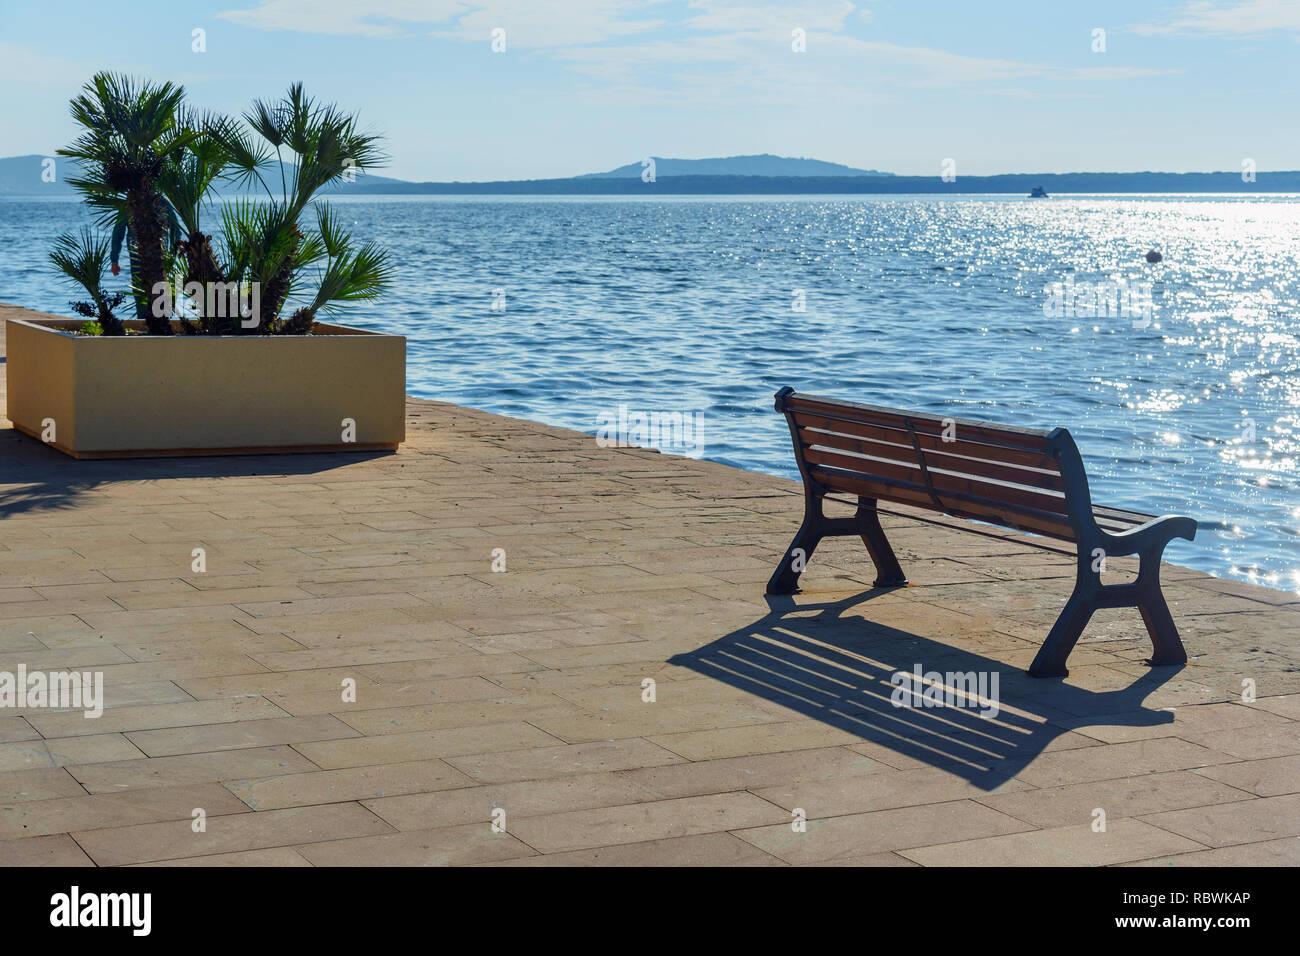 Waterfront of Orbetello on peninsula Argentario in Tuscany. Italy - Stock Image